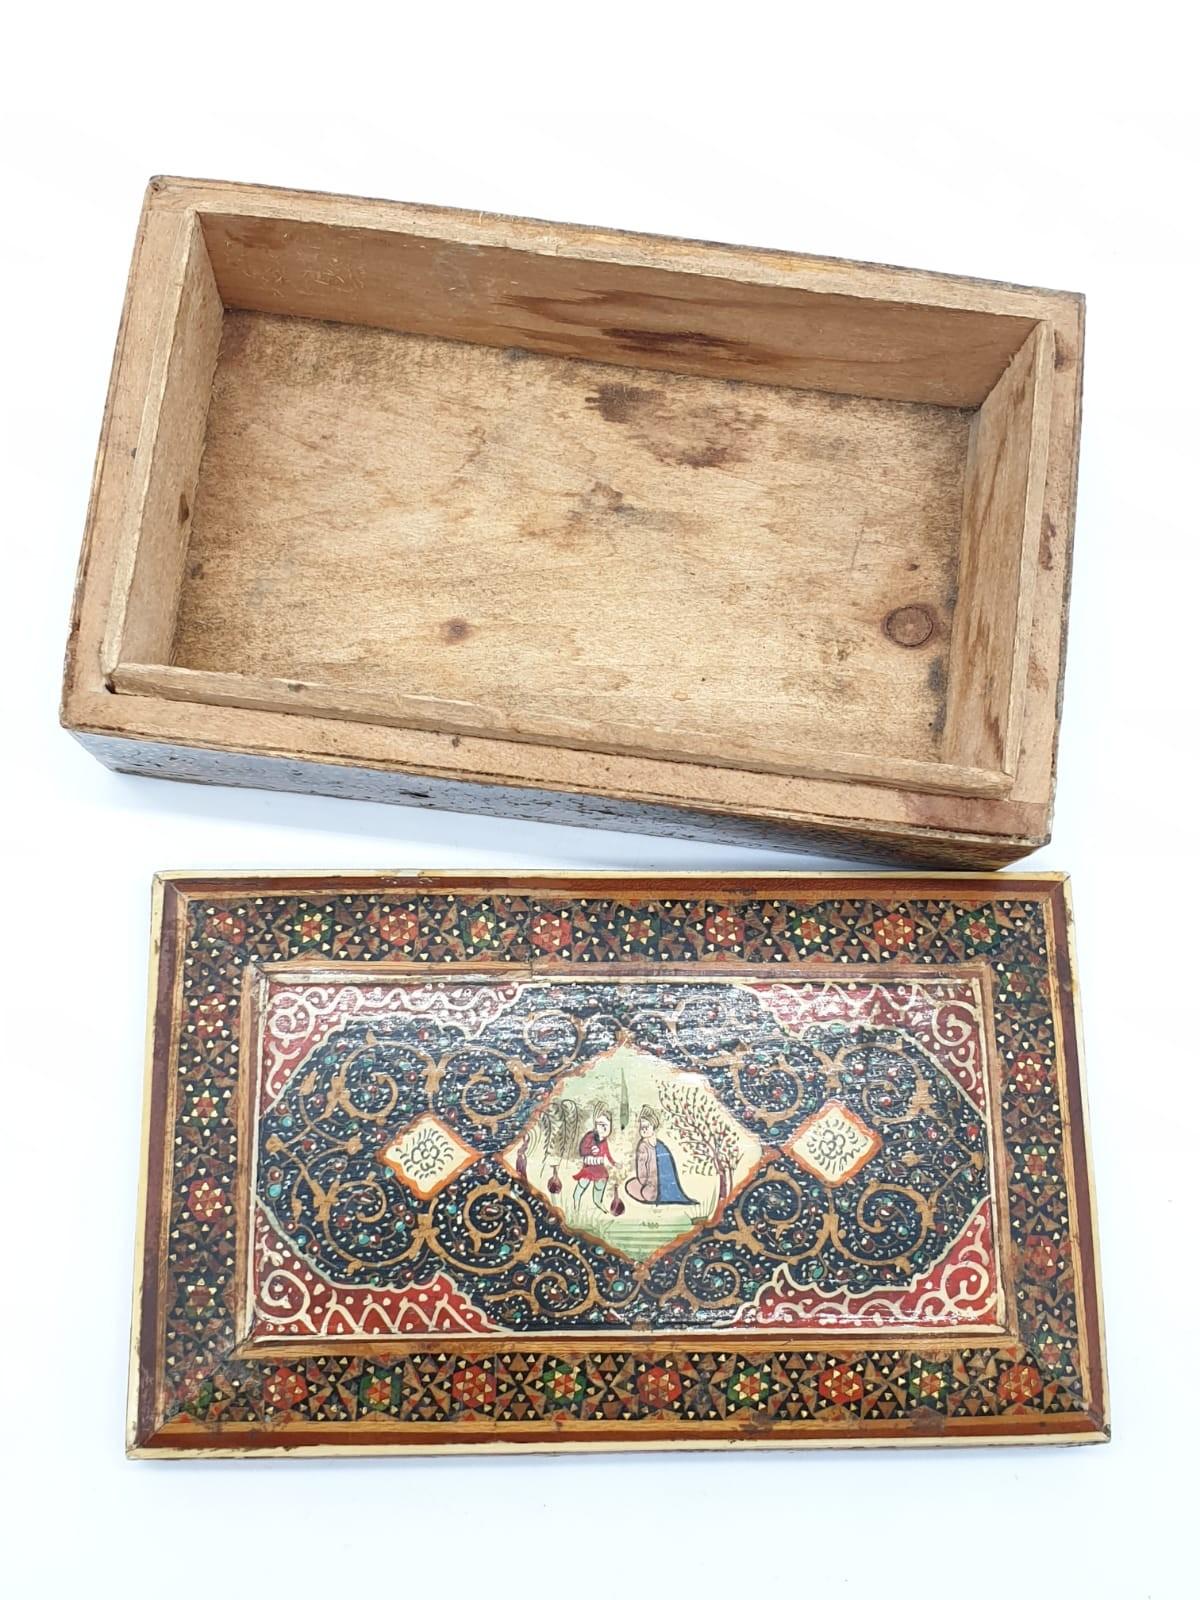 Persian Ghajari micro Mosiac box, 14x8.5cm - Image 3 of 5